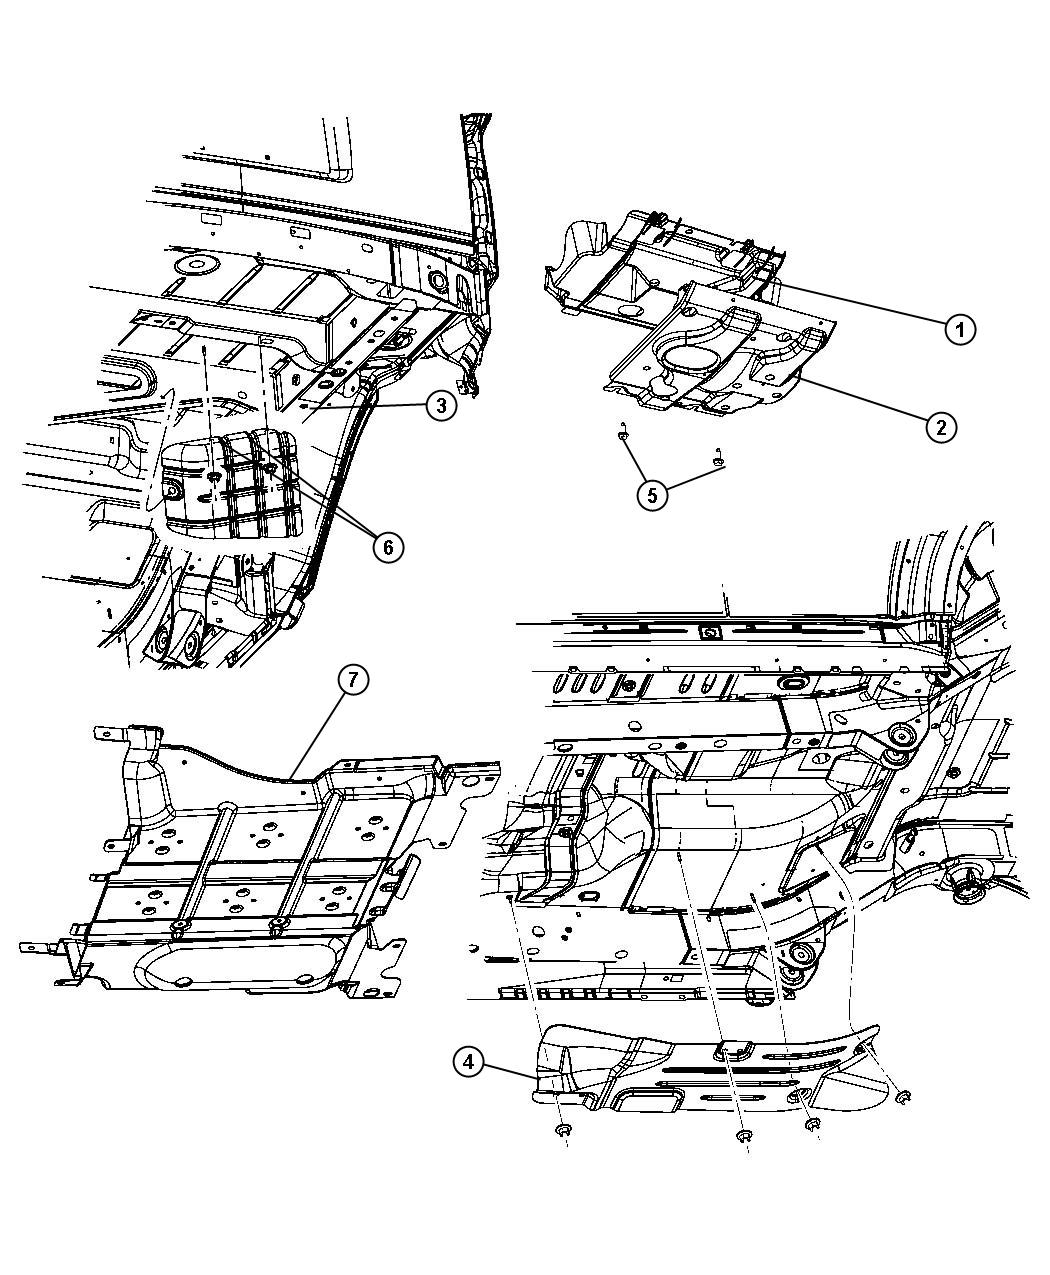 Mopar Front Suspension Skid Plate